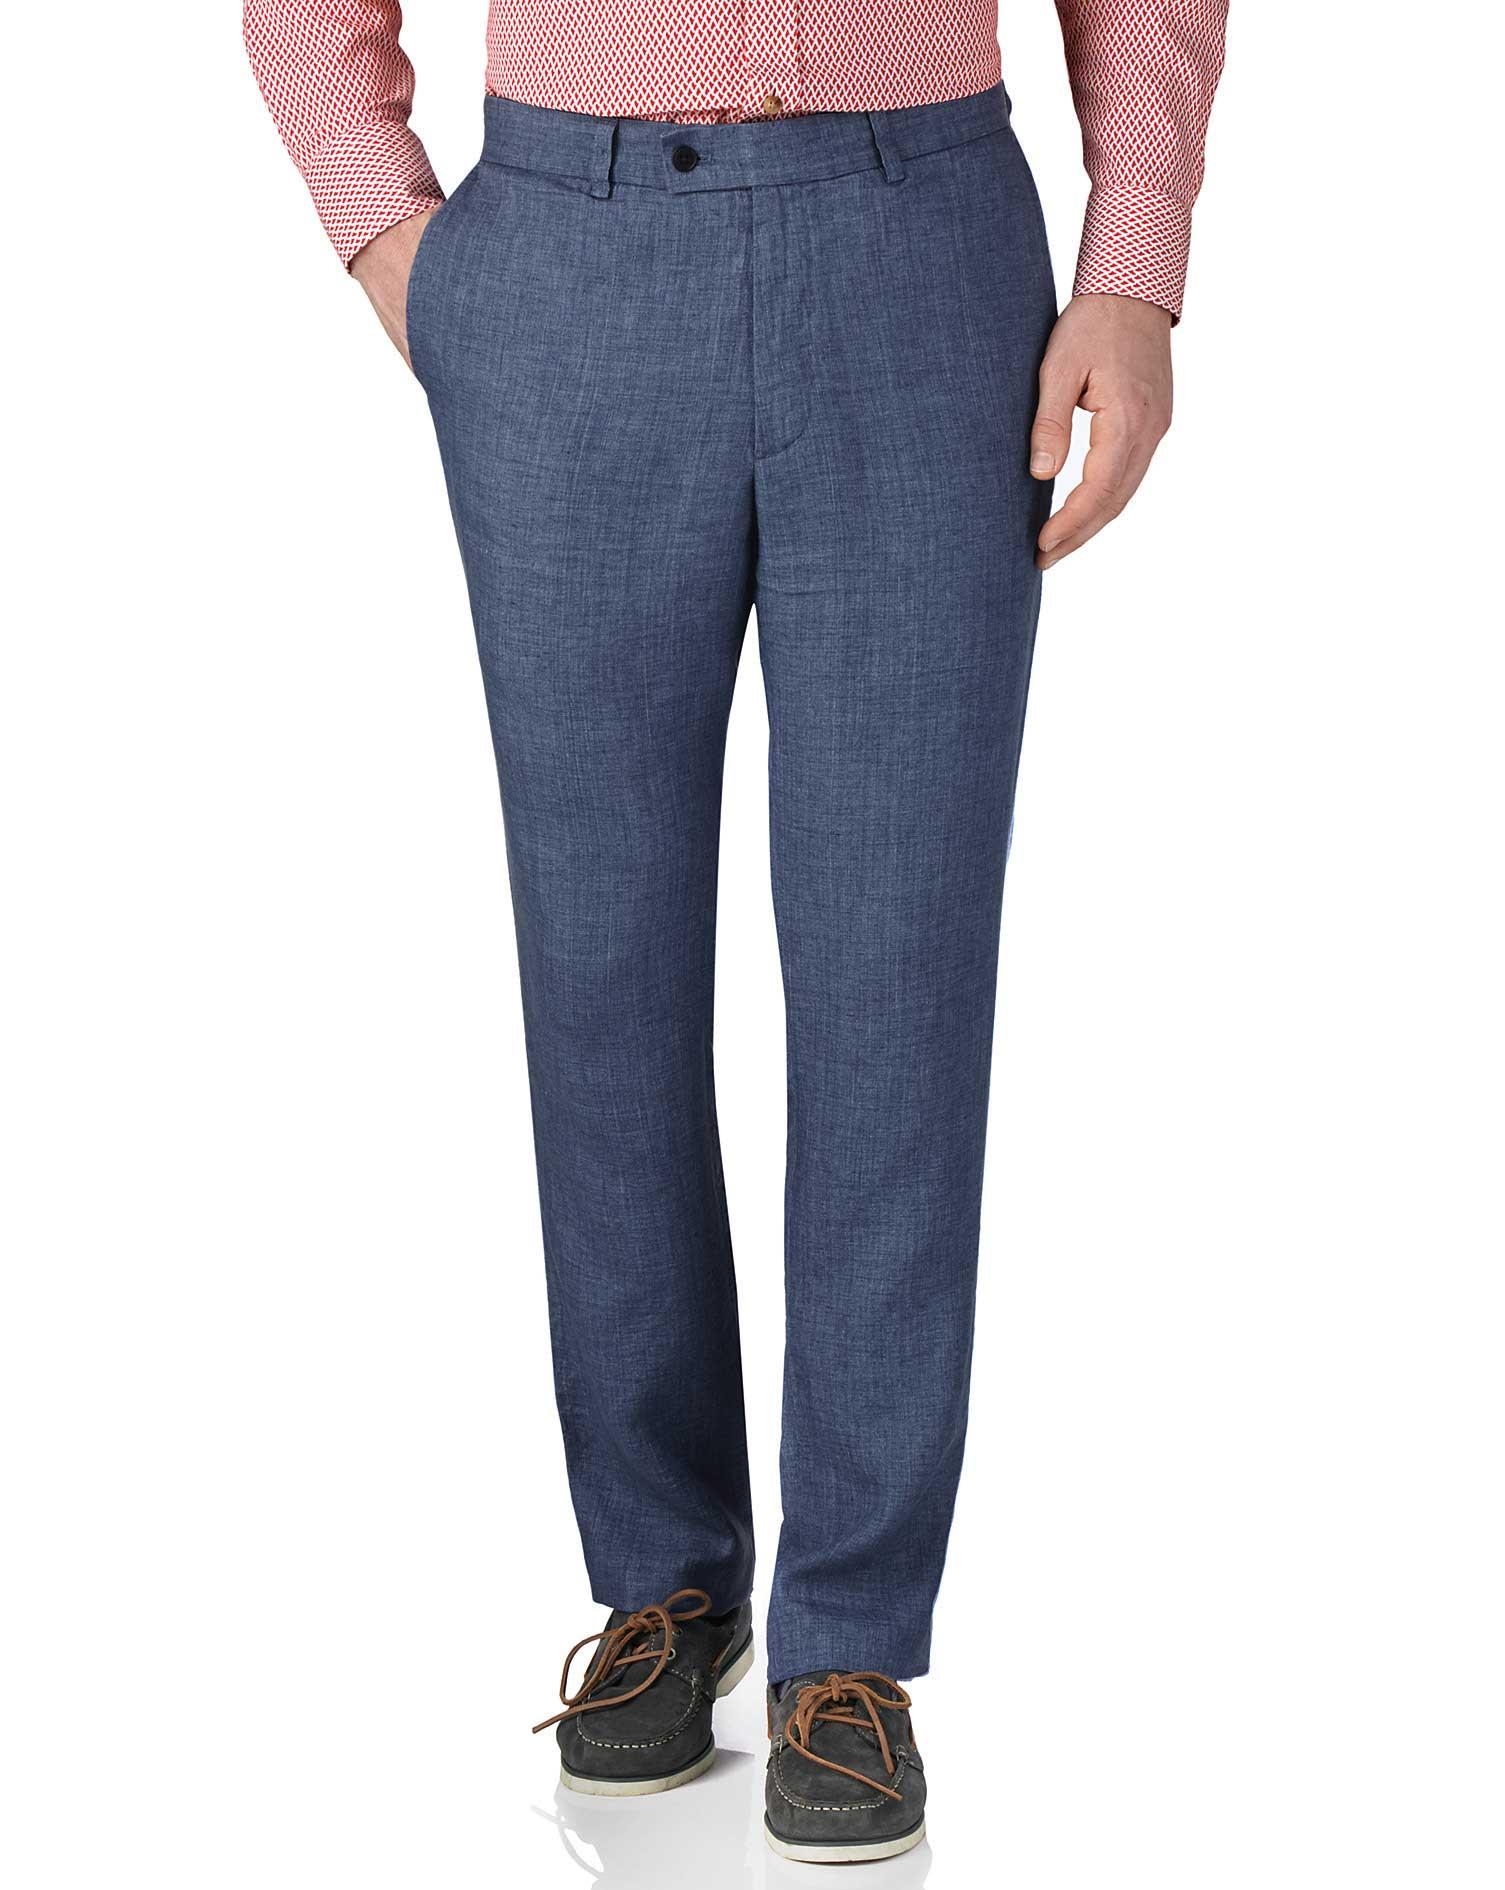 Blue Slim Fit Linen Trousers Size W38 L32 by Charles Tyrwhitt